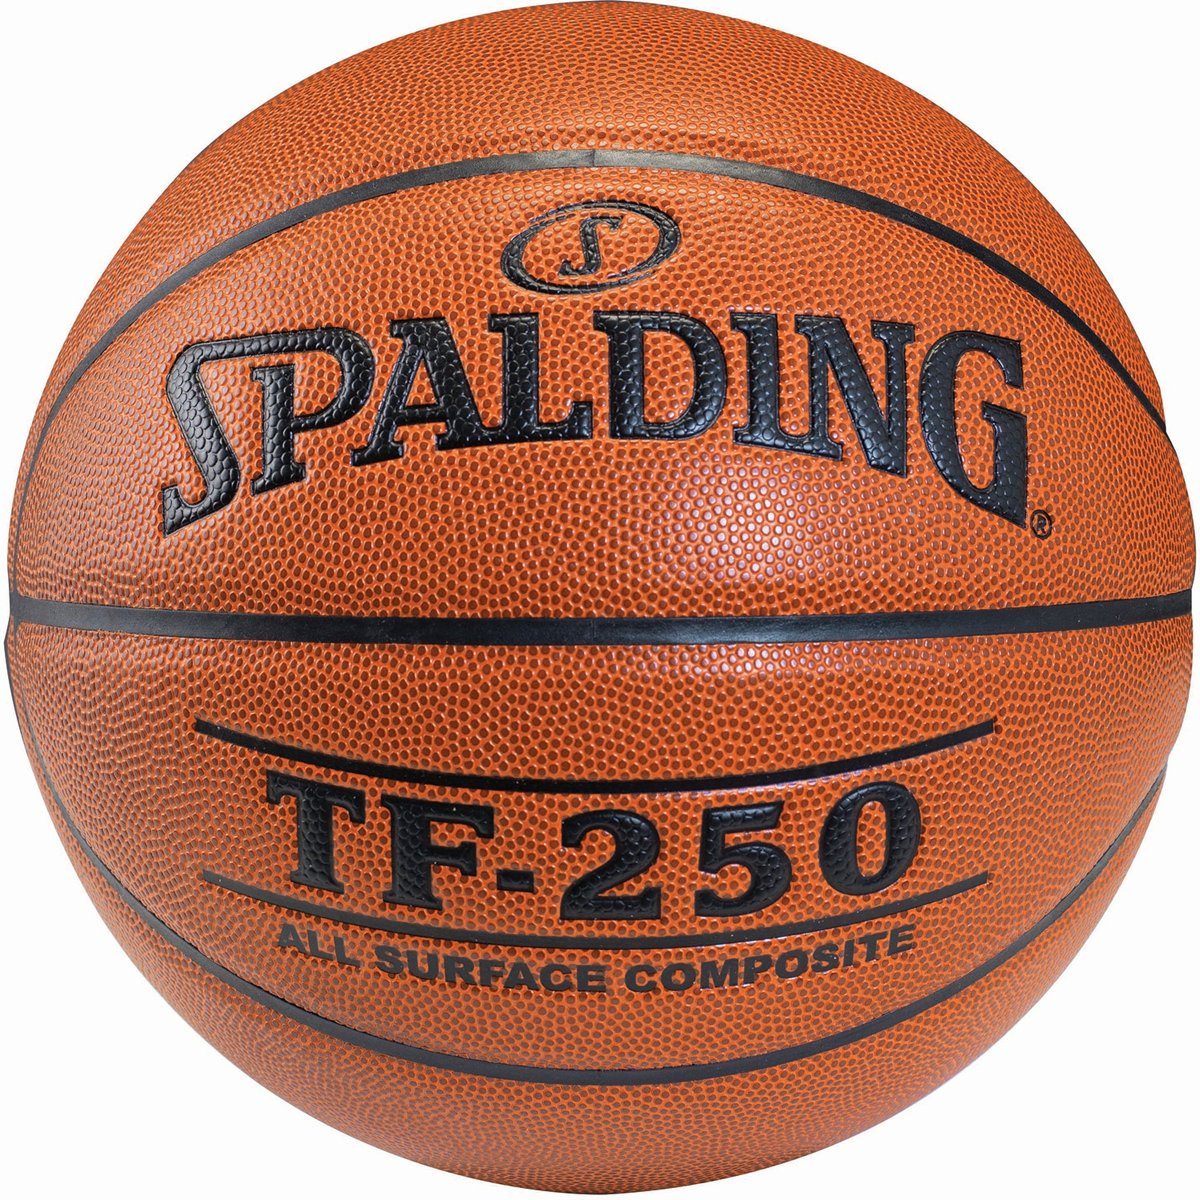 Spalding basketbal TF-250 - maat 7 - in- en outdoor